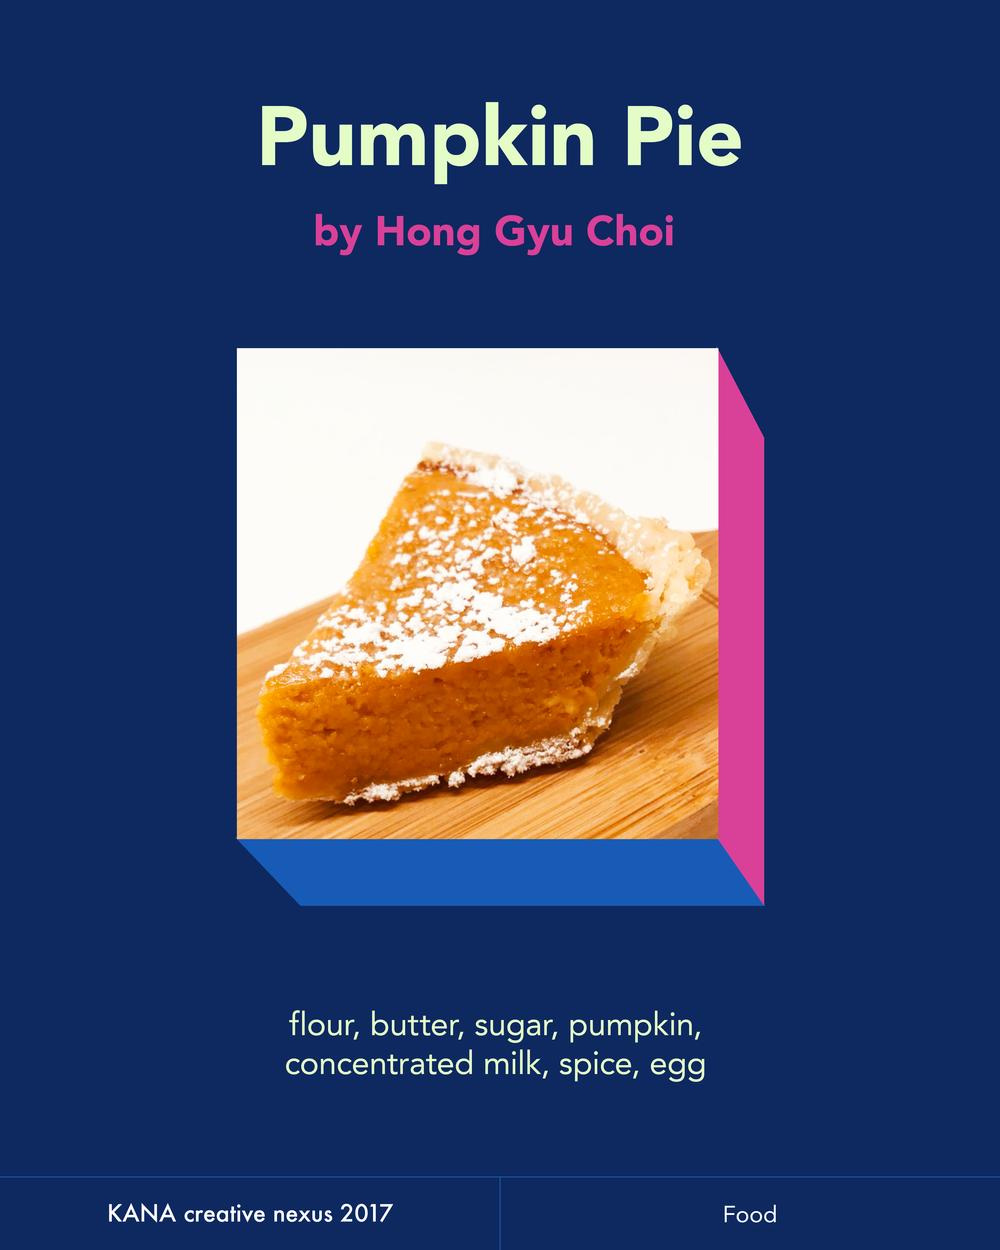 KANA_Social_Food_Pumpkin Pie.png